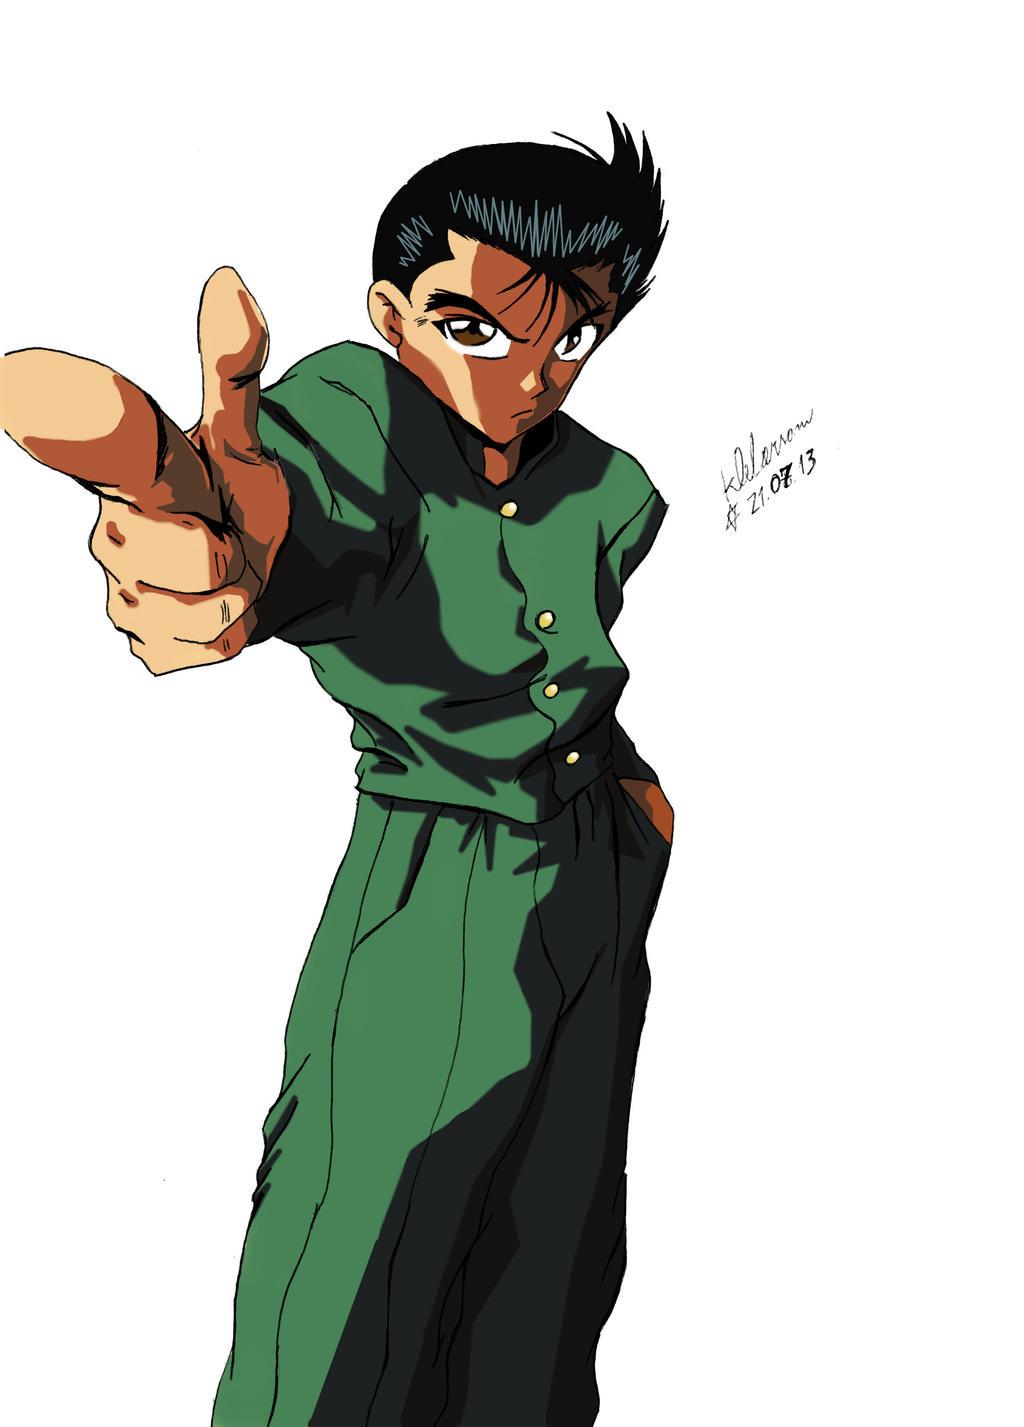 Yusuke urameshi by klebz1 on deviantart for Yusuke demon